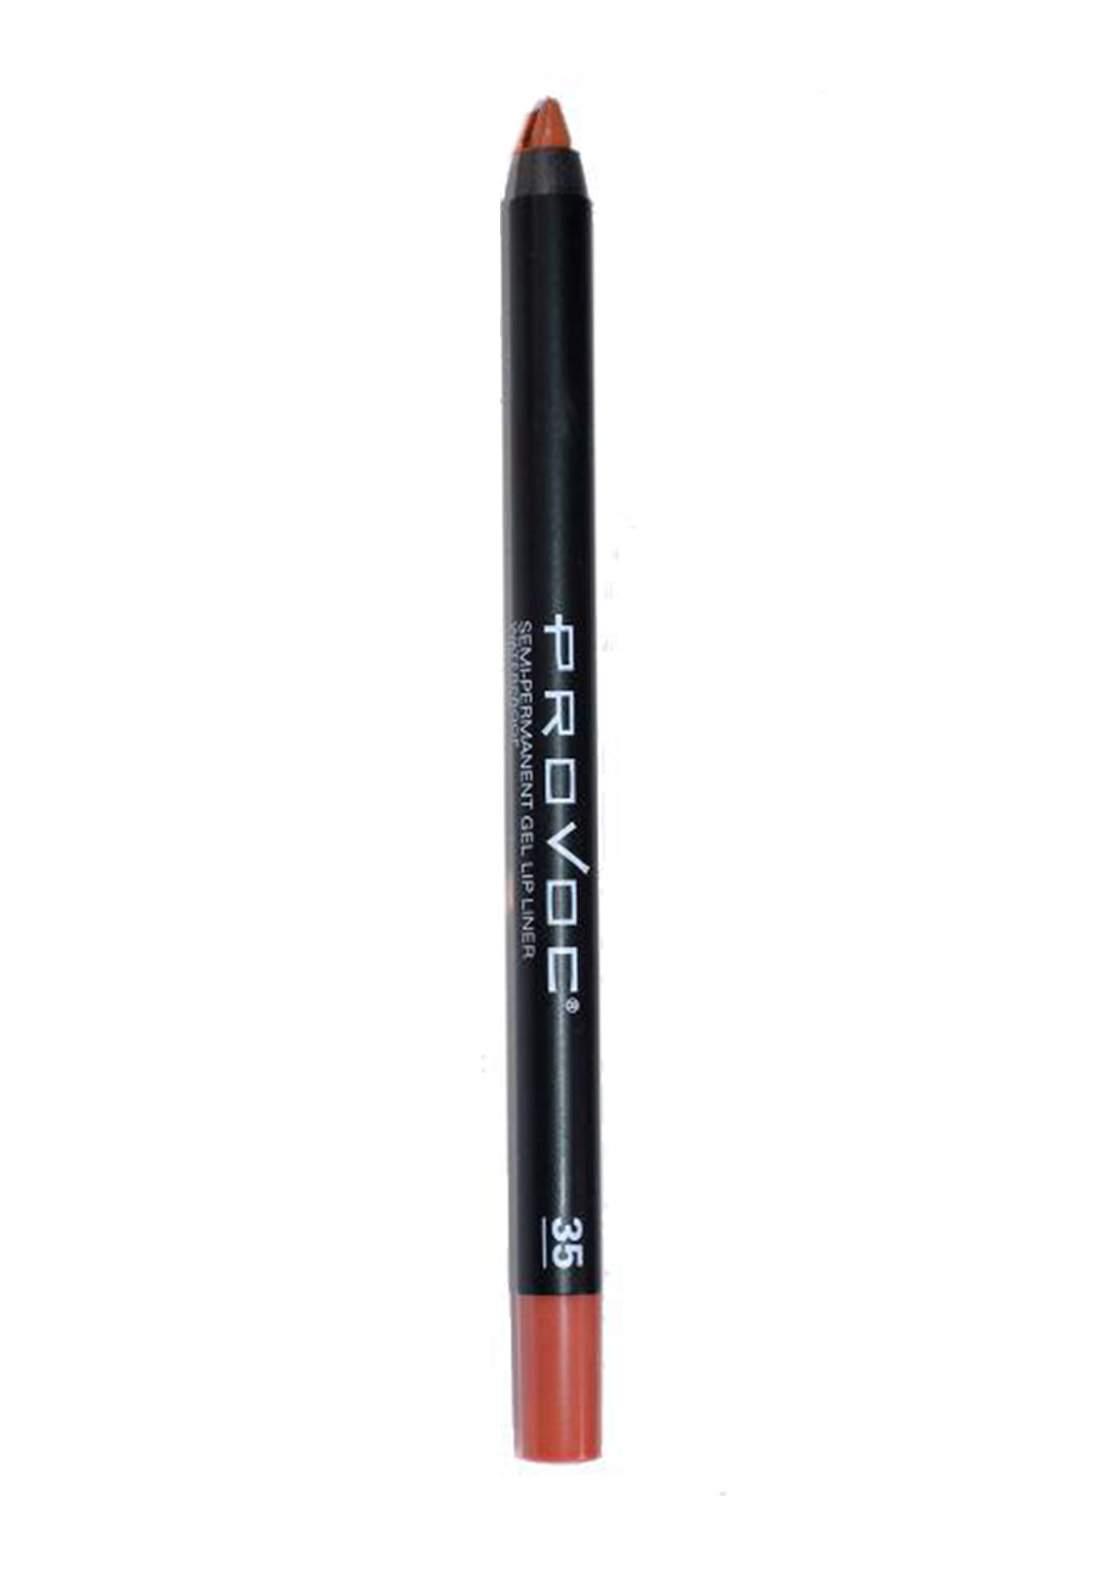 Provoc 353-0052 Semi Permanent Gel Lip Liner Pencil No.35 Sexy Silhouette محدد الشفاه